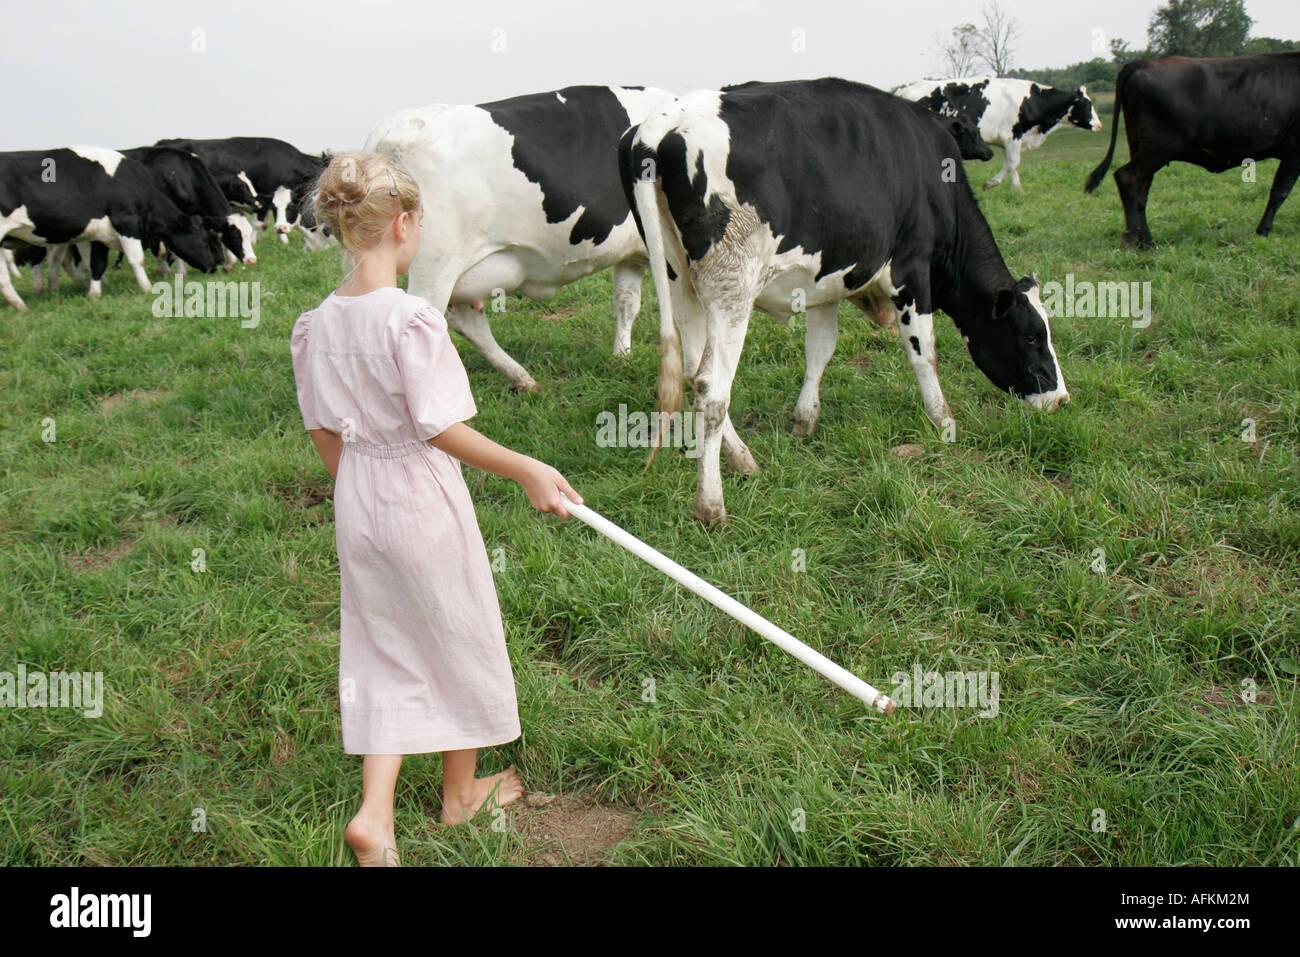 Indiana Shipshewana Amish Farm Tour Girl Corralling